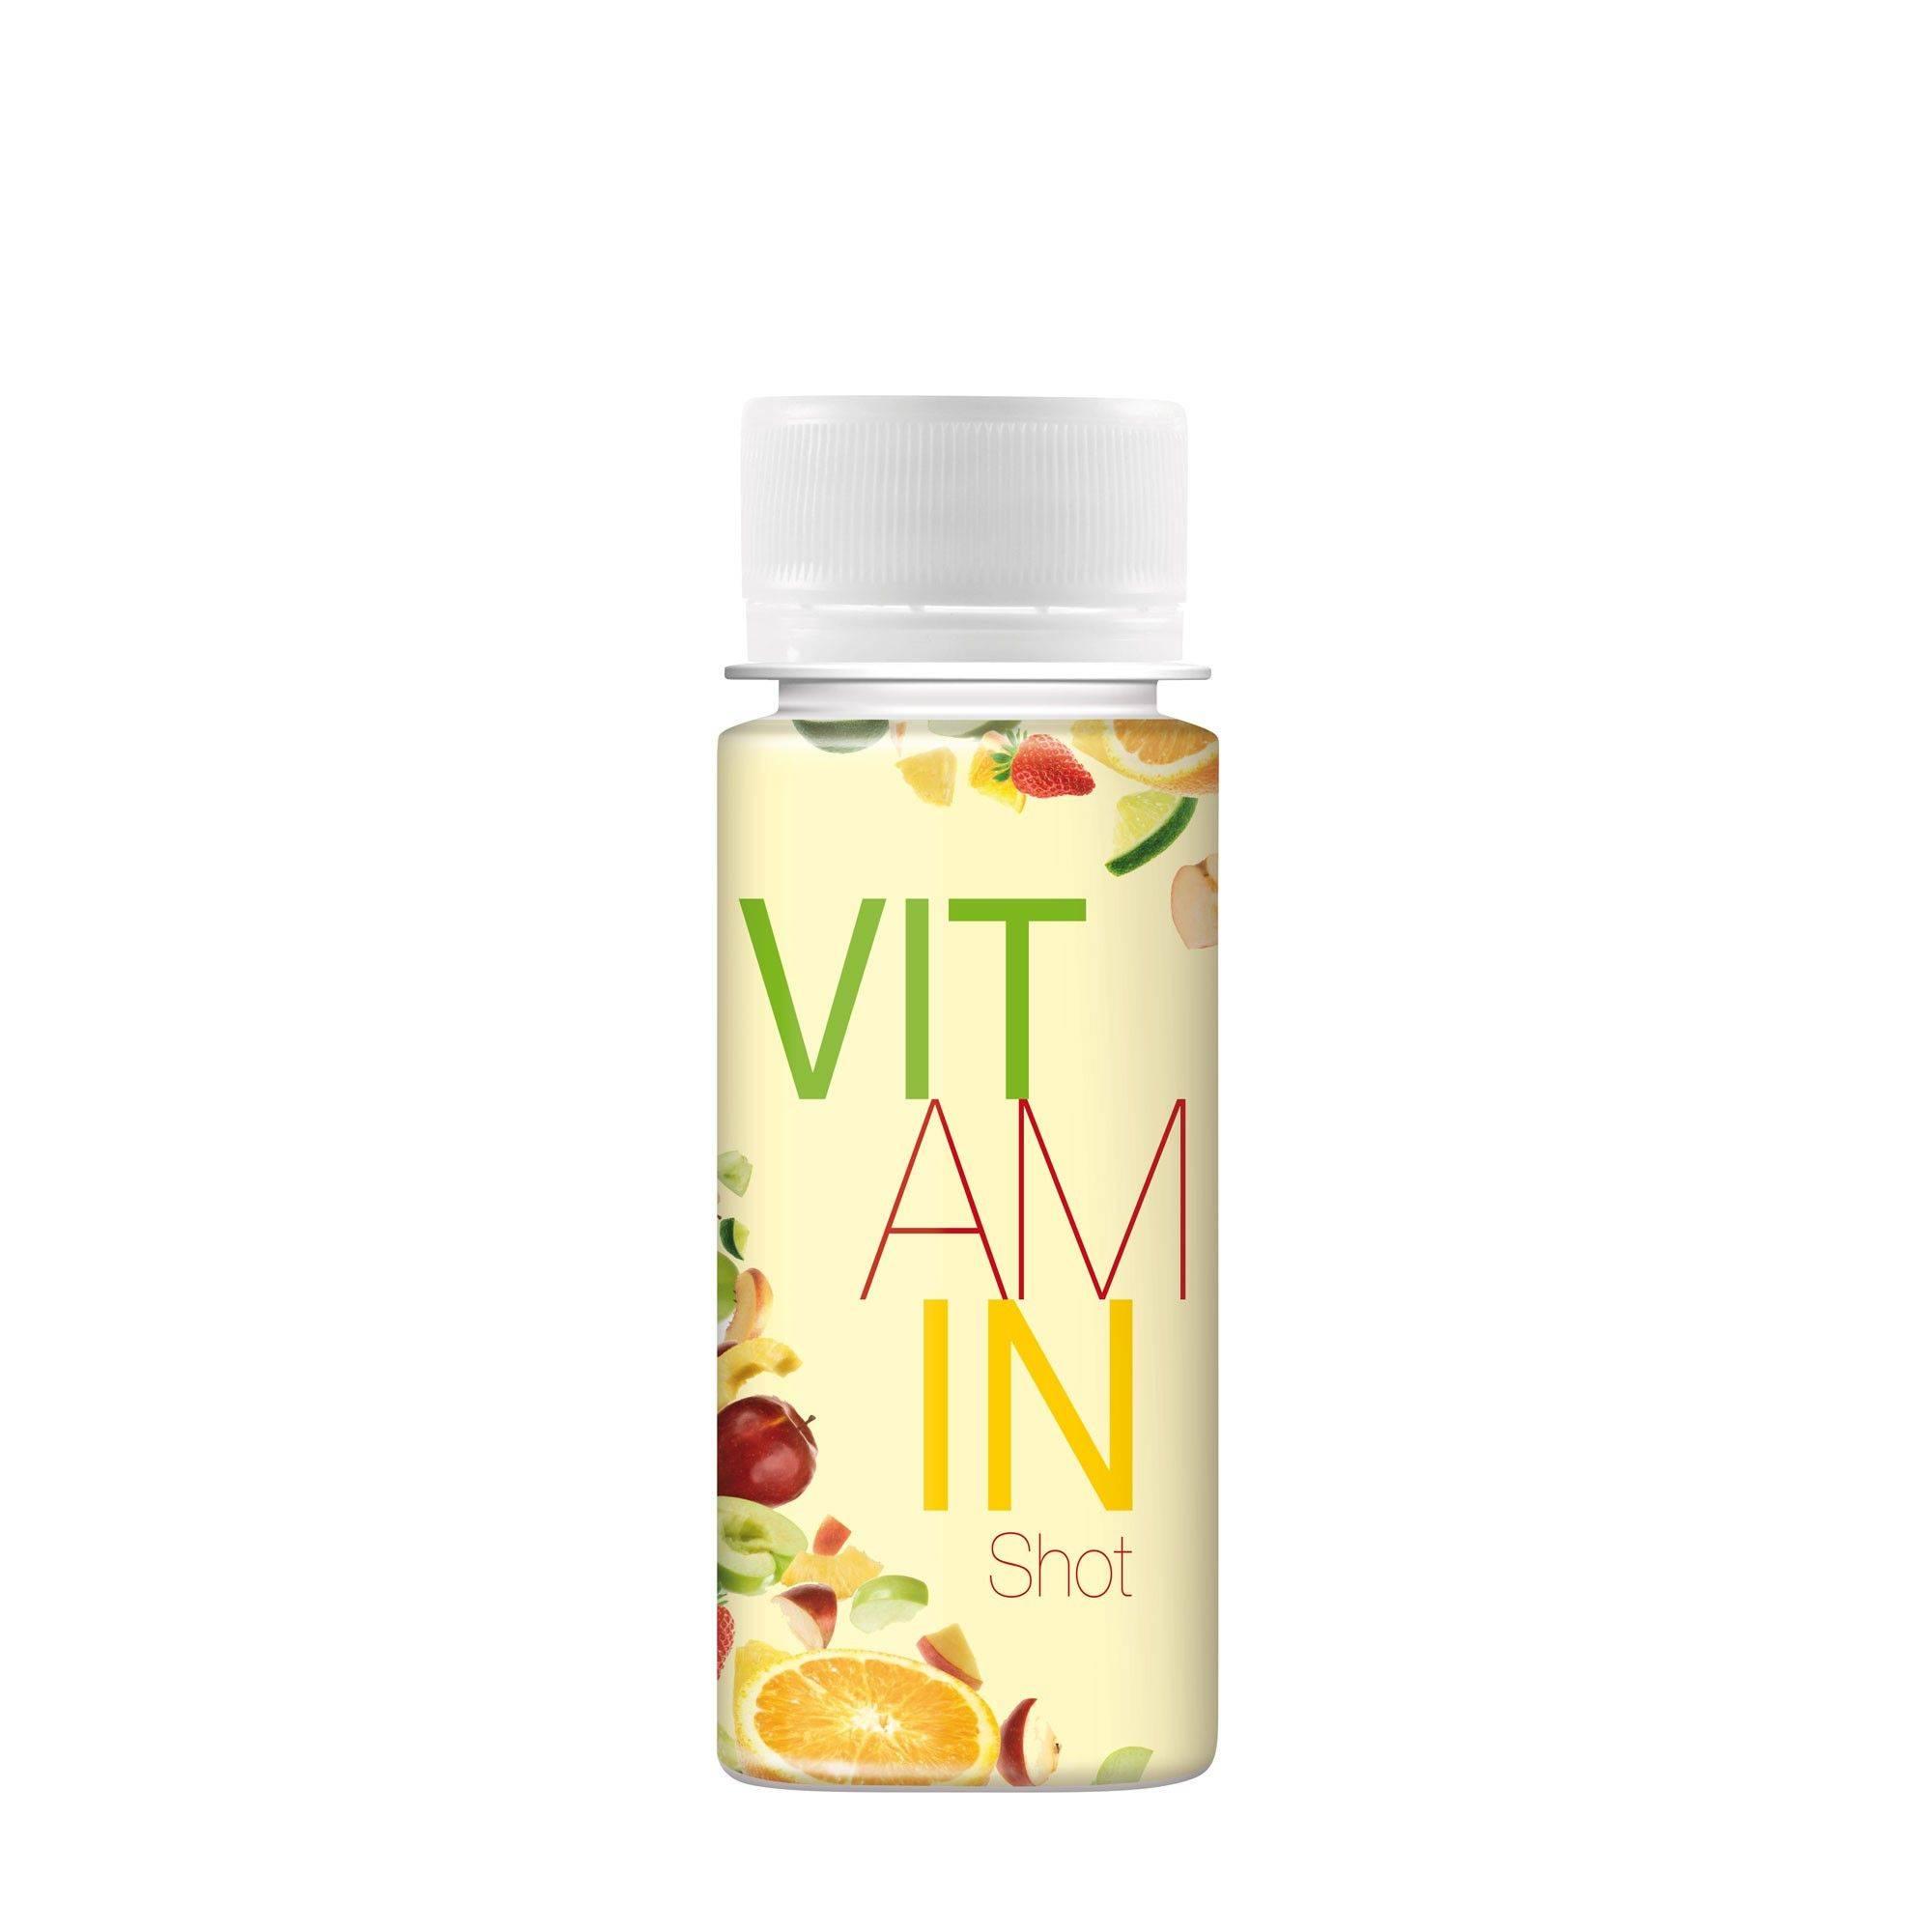 Vitamin Shot 60 ml bedrucken (Werbeartikel) - ab 1,09 €